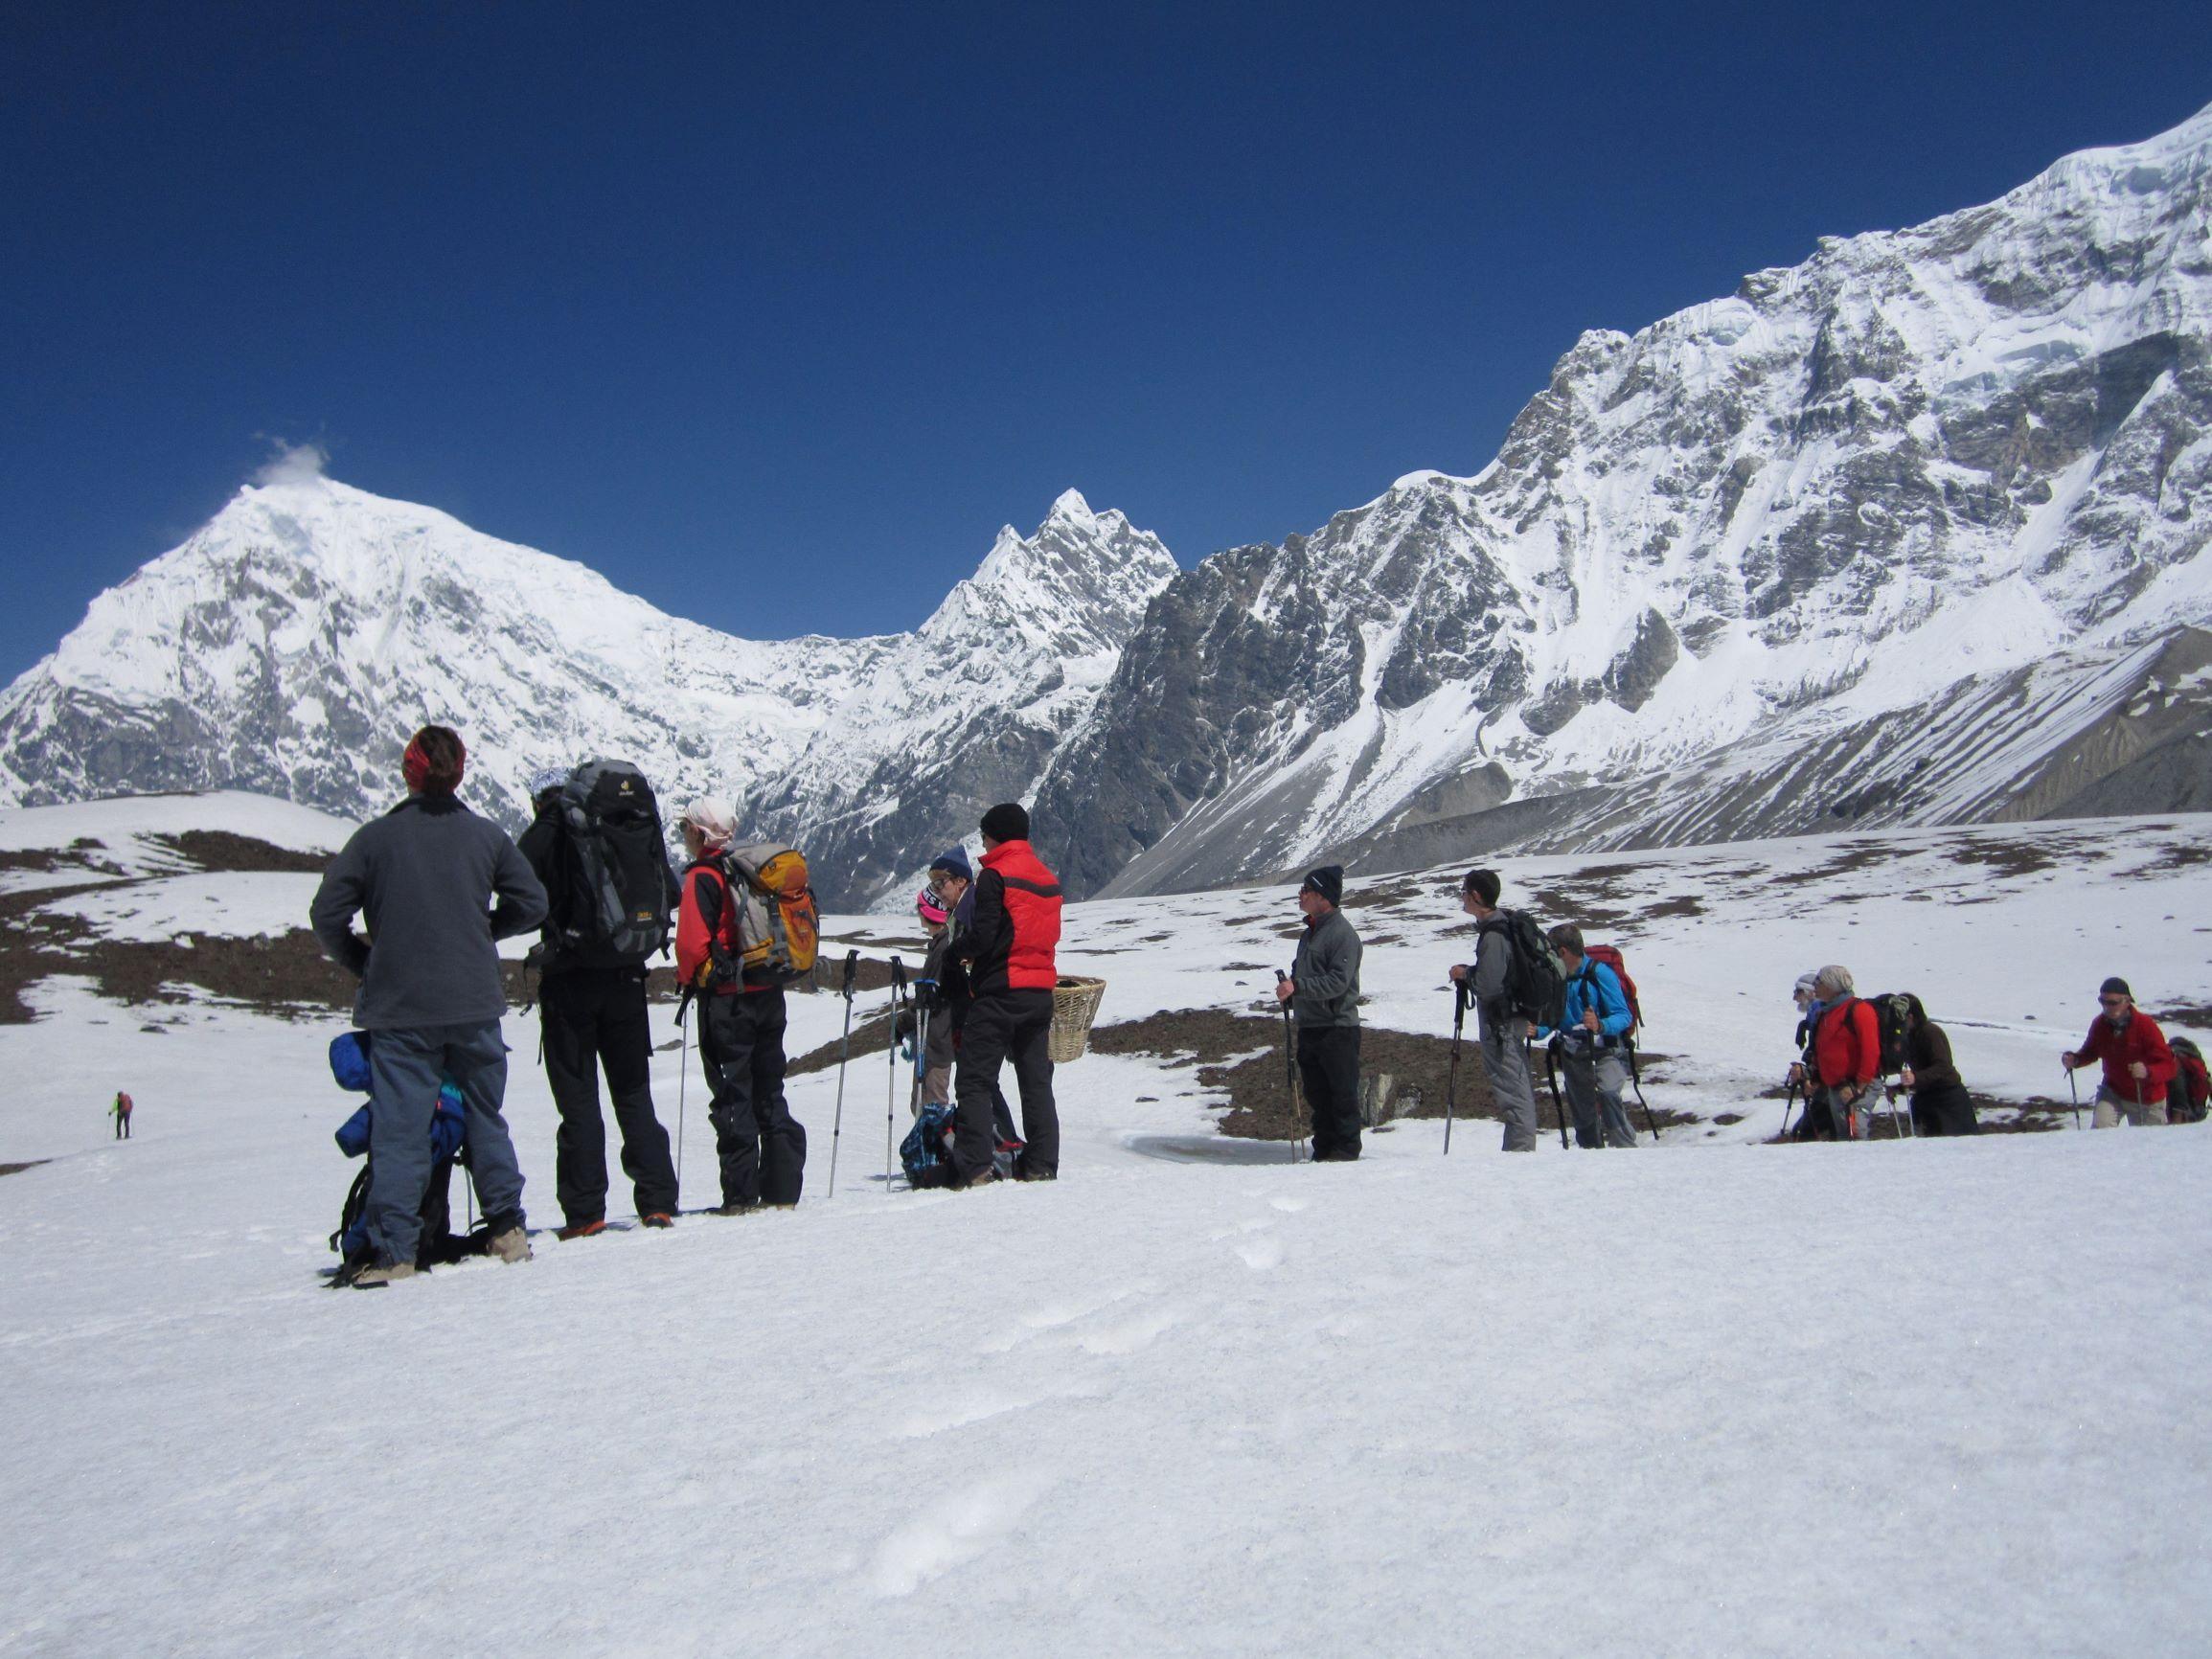 Mustang Circuit Trekking, Adventurous Treks in Nepal, Land of Upper Mustang, Mustang Trekking Itinerary, Mustang Circuit Trek.